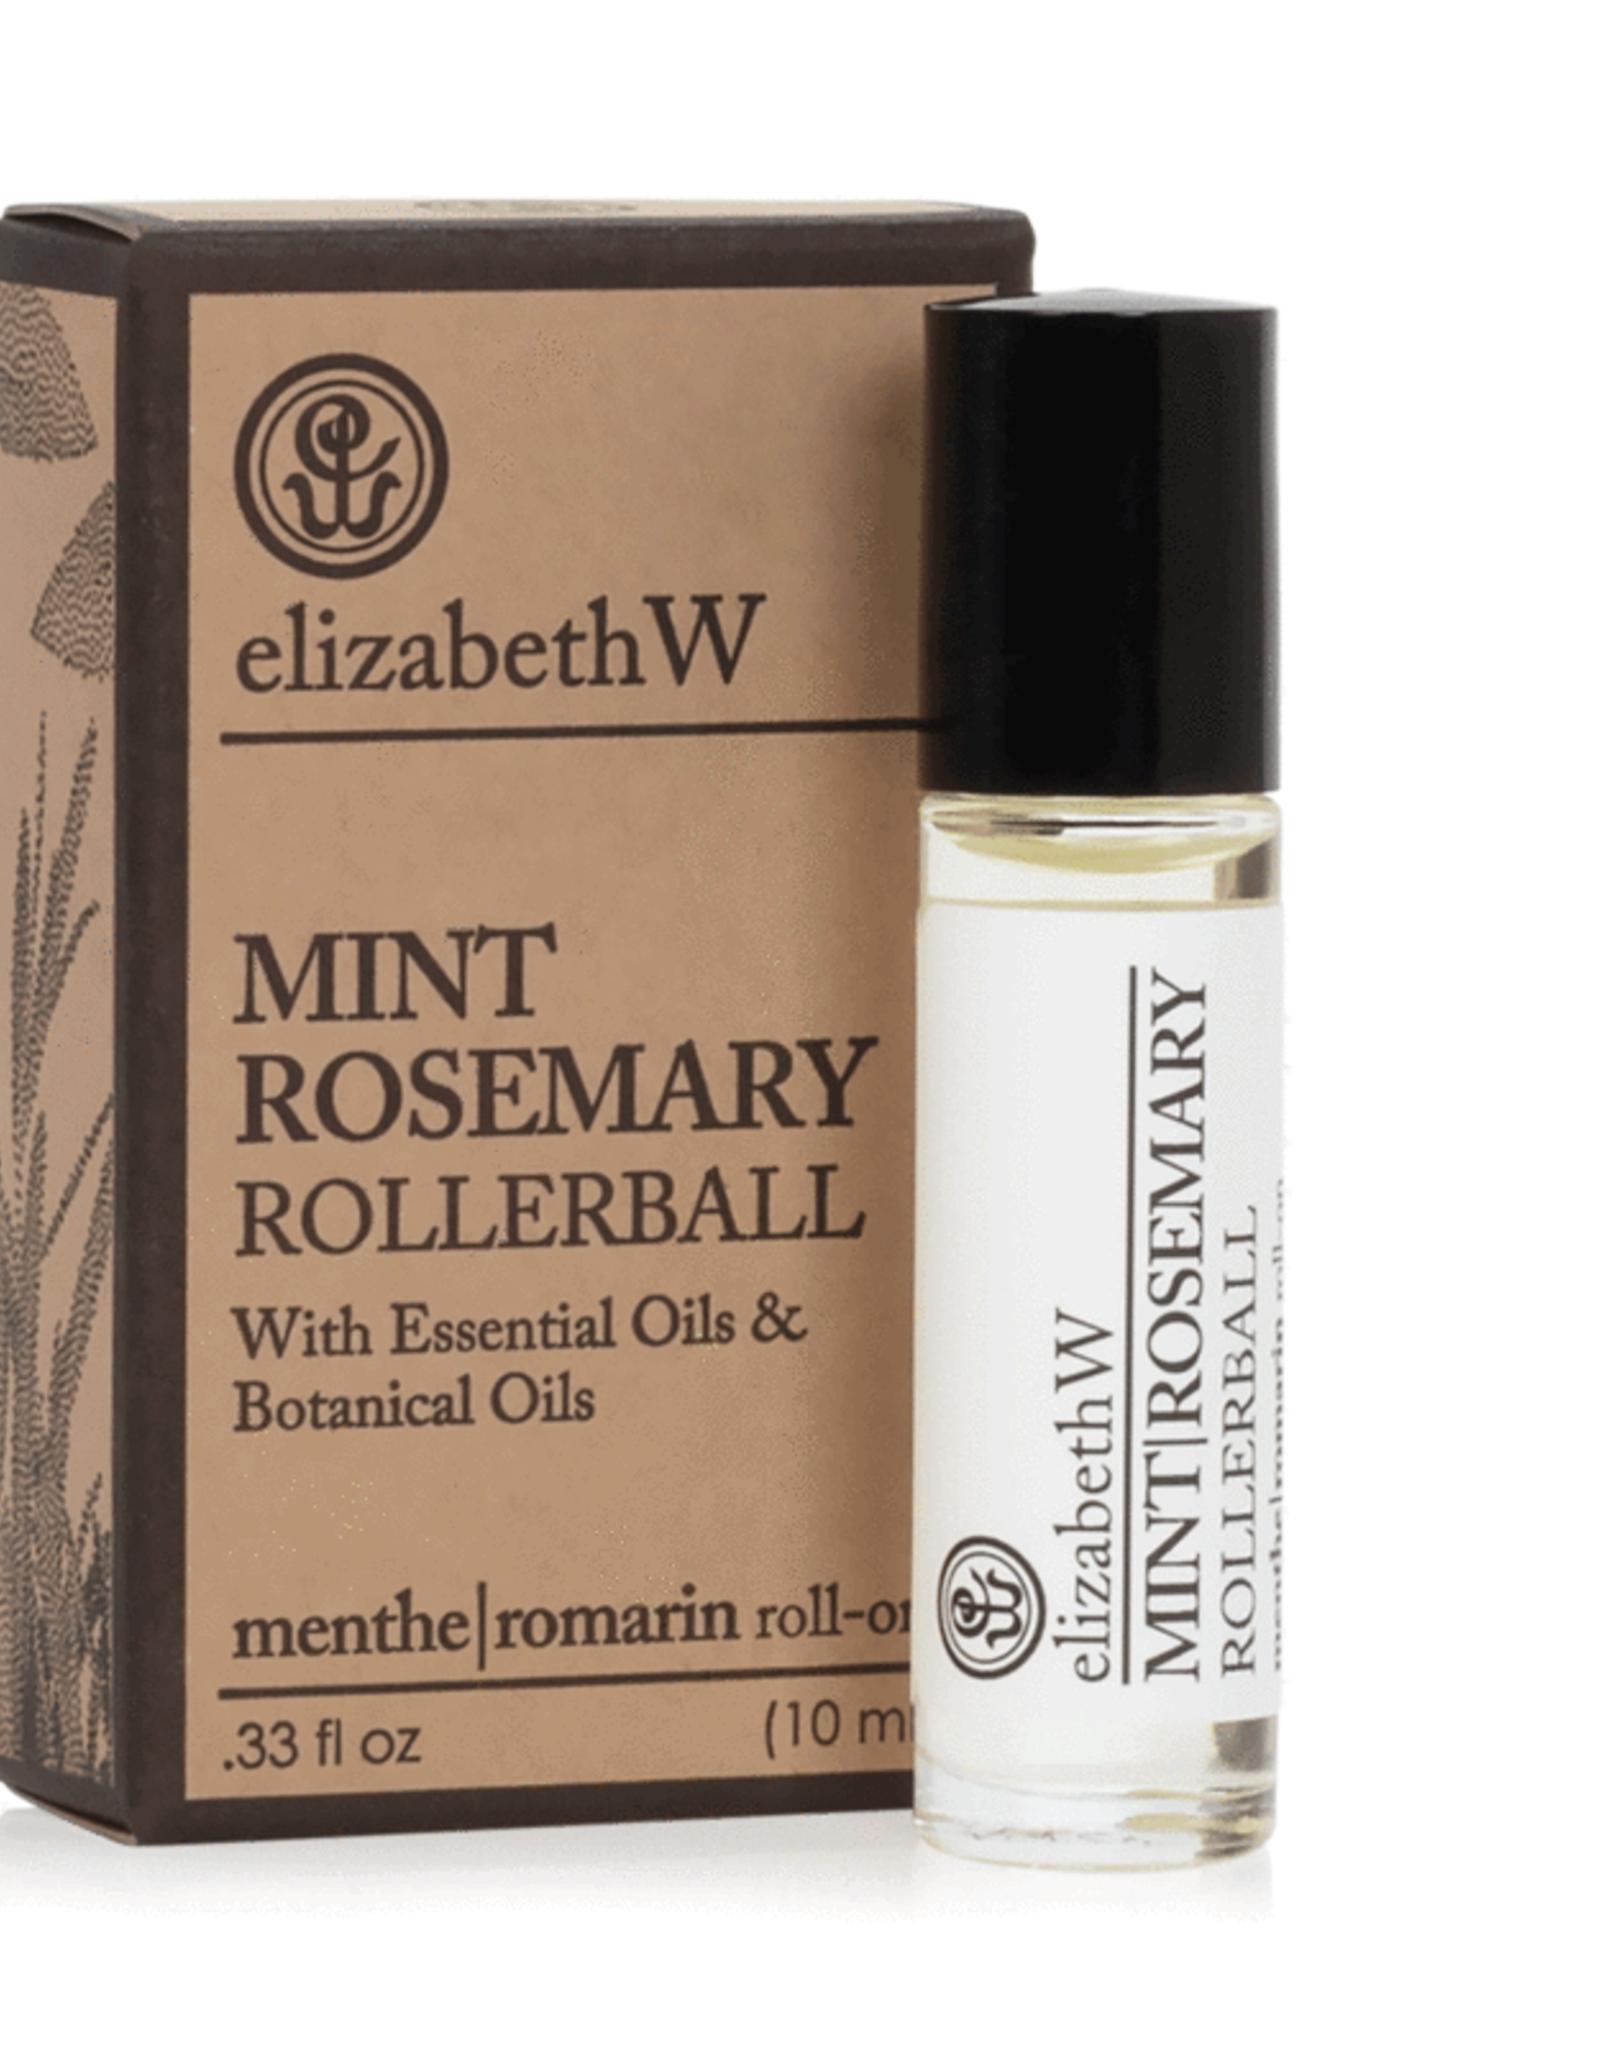 Elizabeth W Mint Rosemary Perfume Oil Rollerball